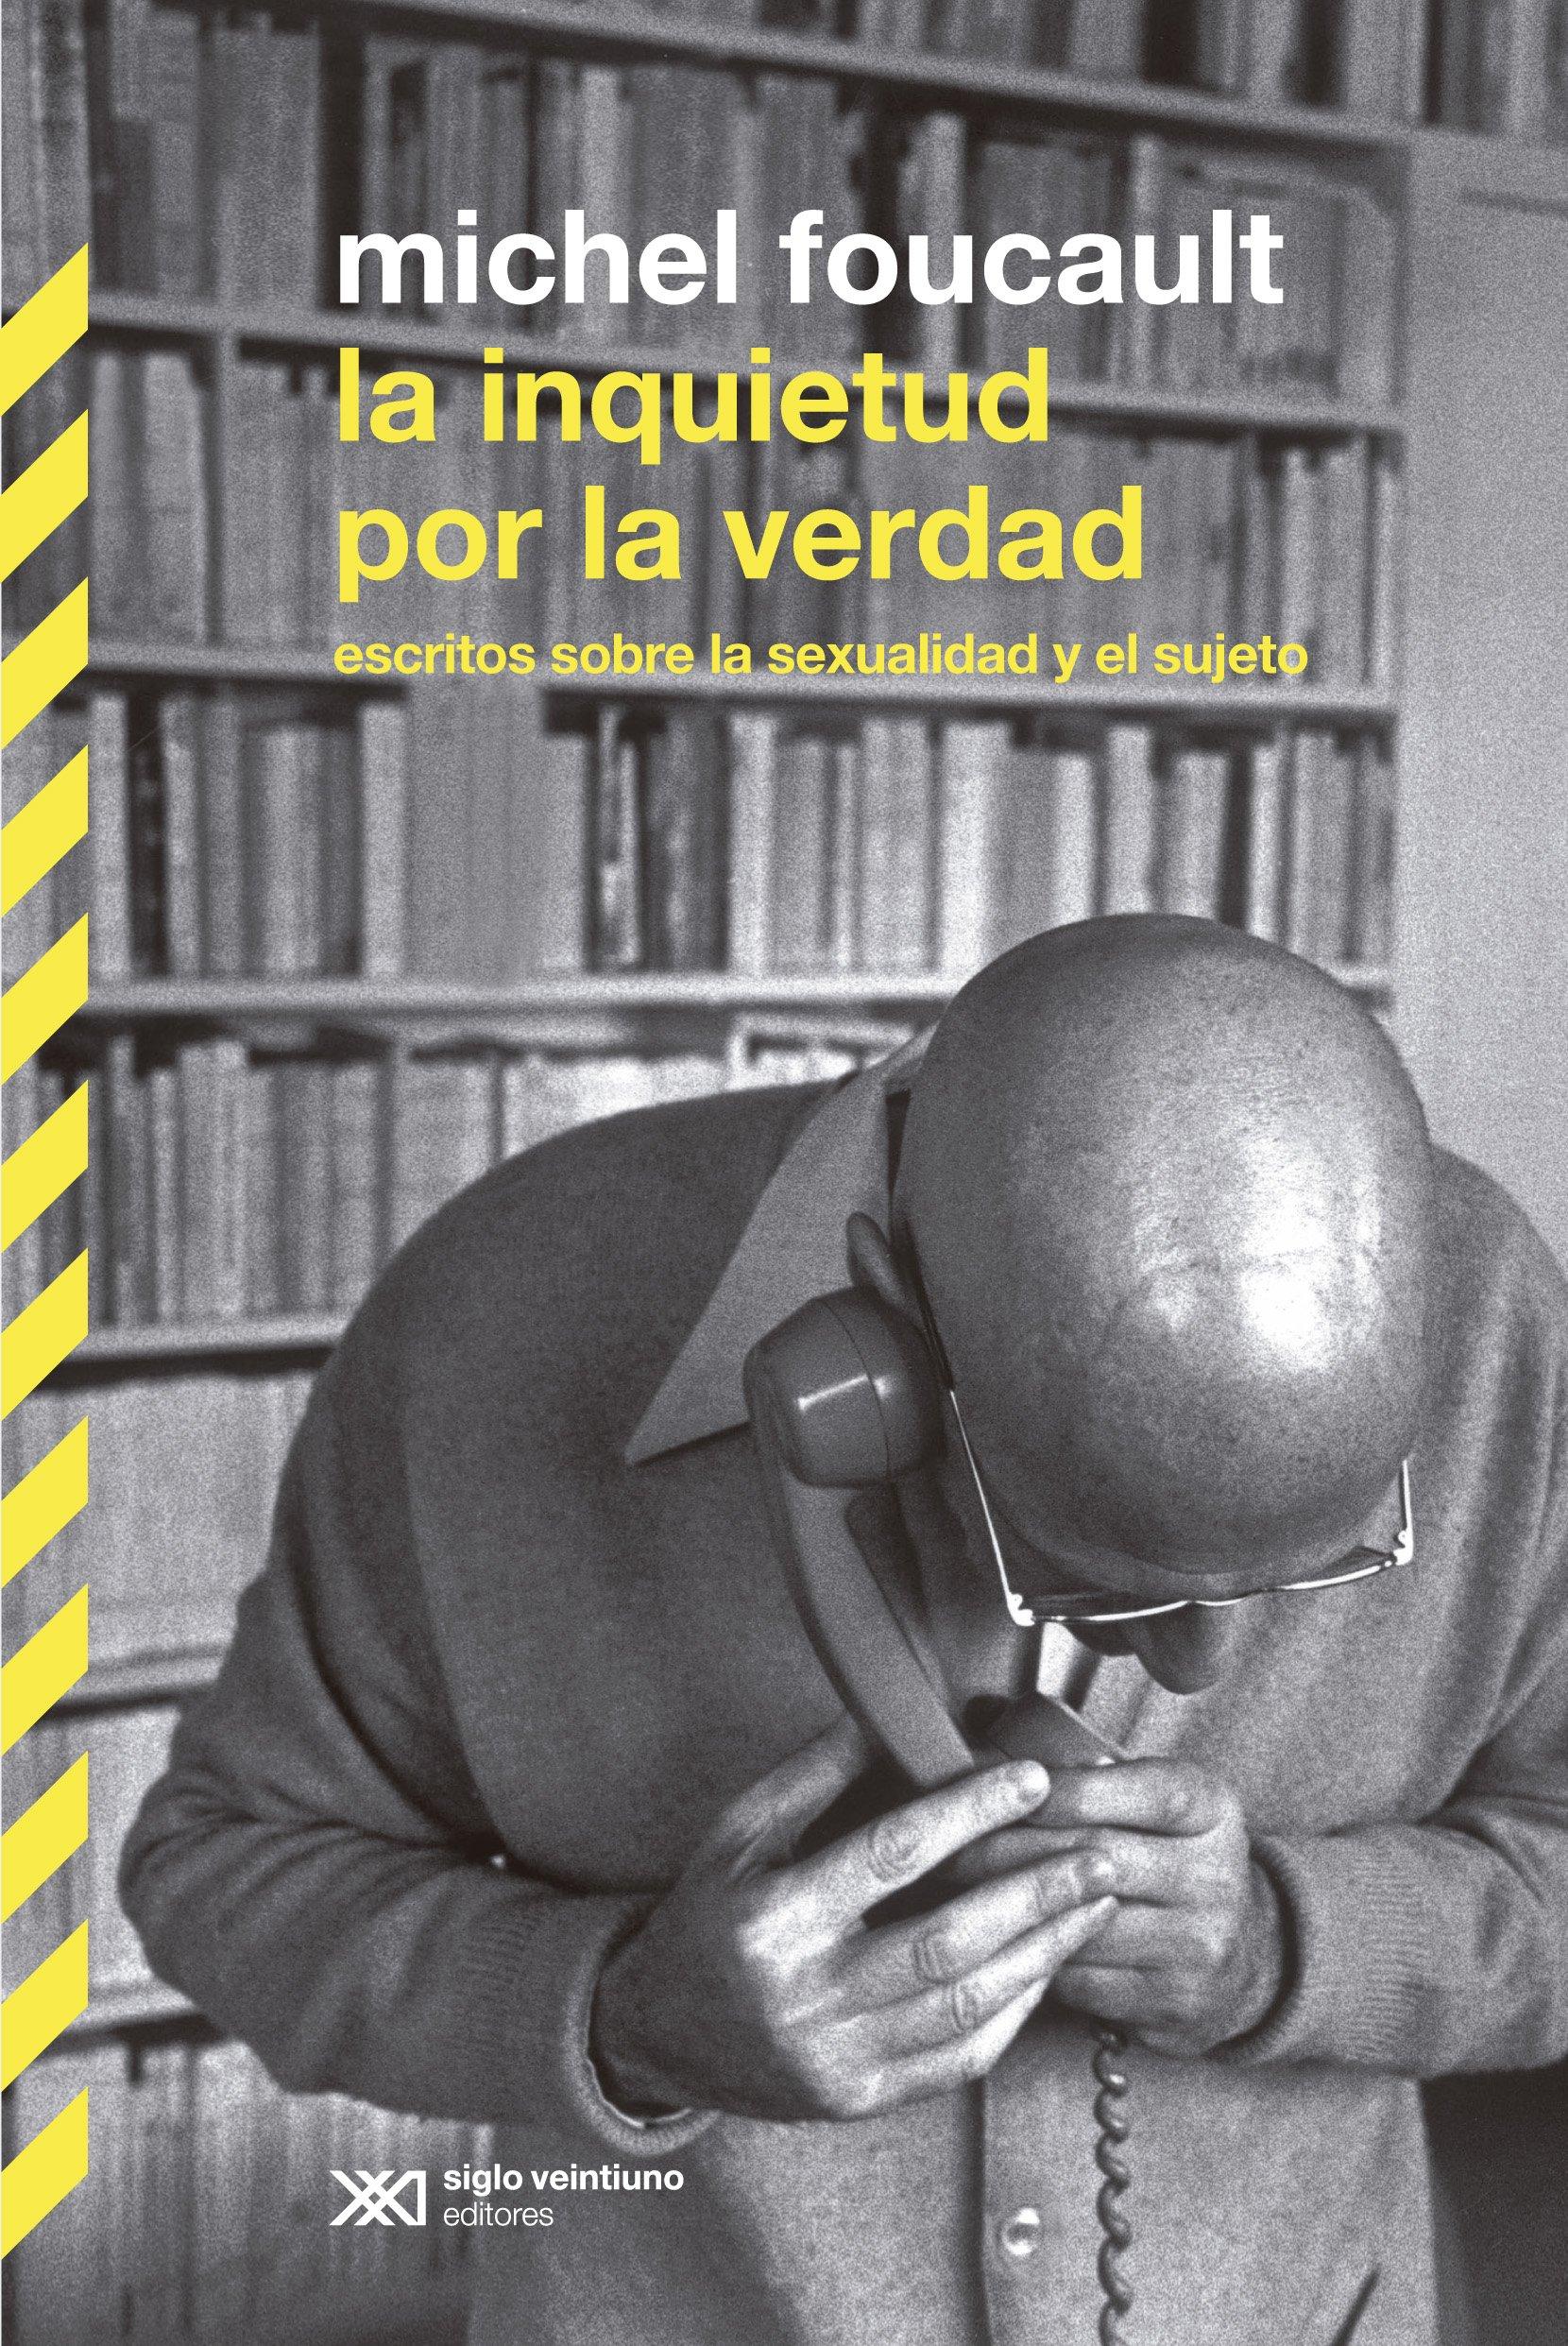 La inquietud por la verdad (Spanish Edition): Michel Foucault, Siglo XXI Editores: 9789876292634: Amazon.com: Books